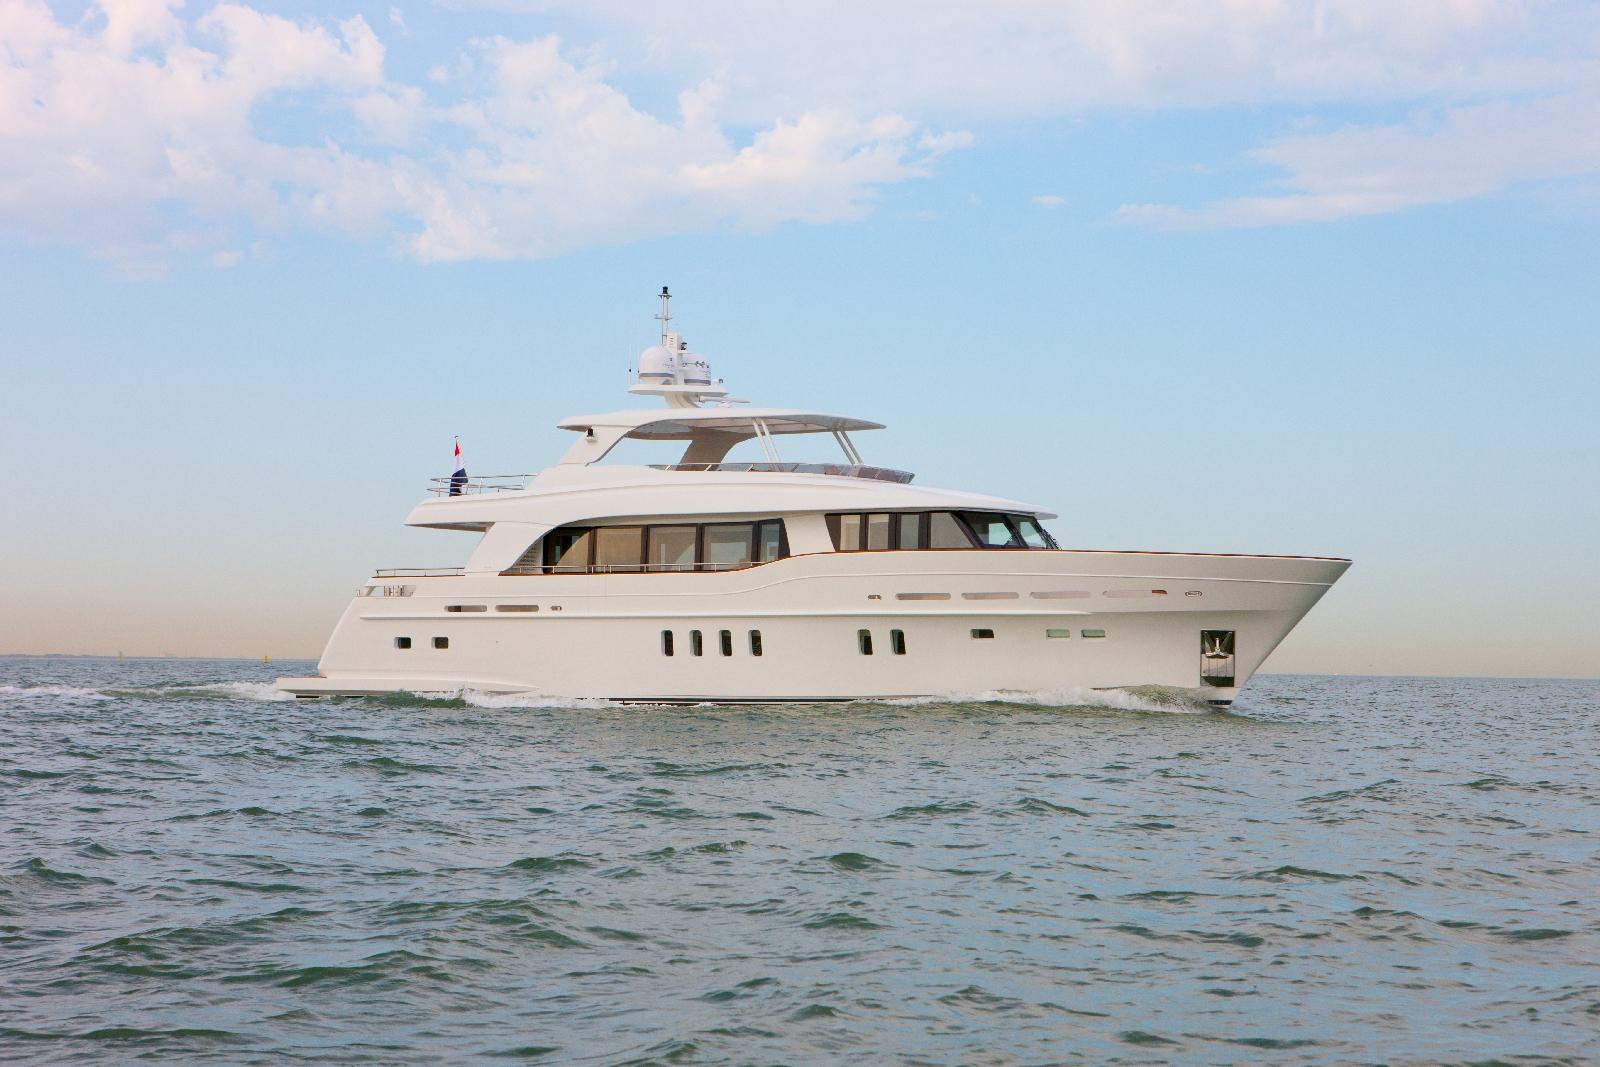 Motor yacht firefly available for croatia yacht charter for Motor yacht charter croatia